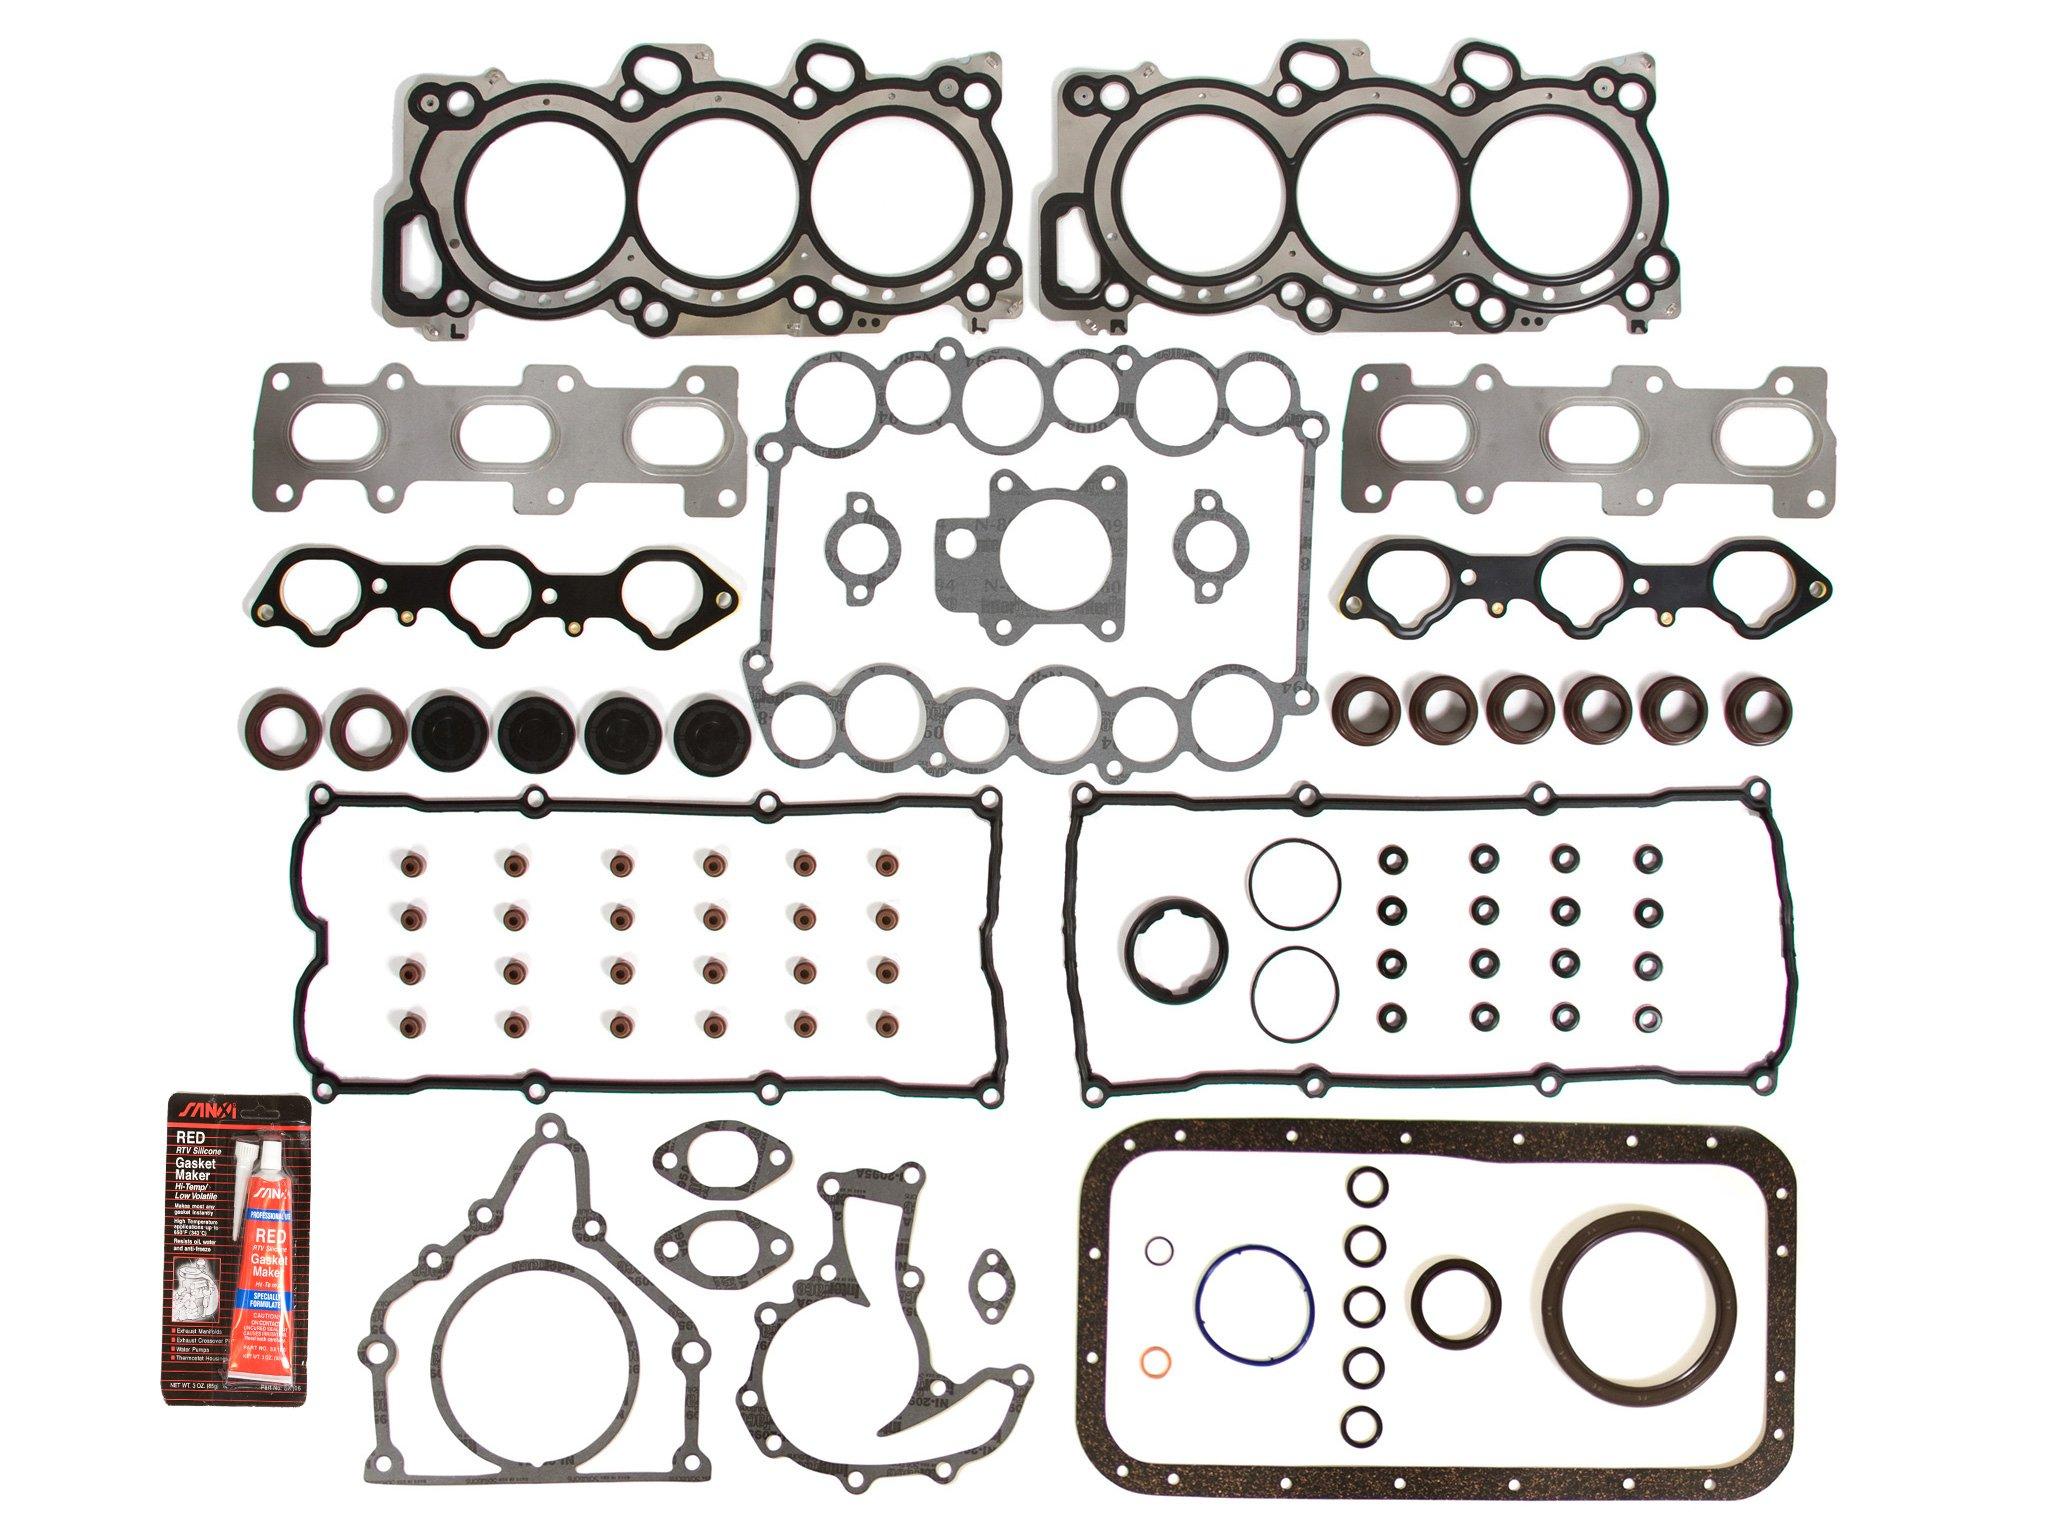 Engine Full Gasket Set Fel-Pro FS 21132 C